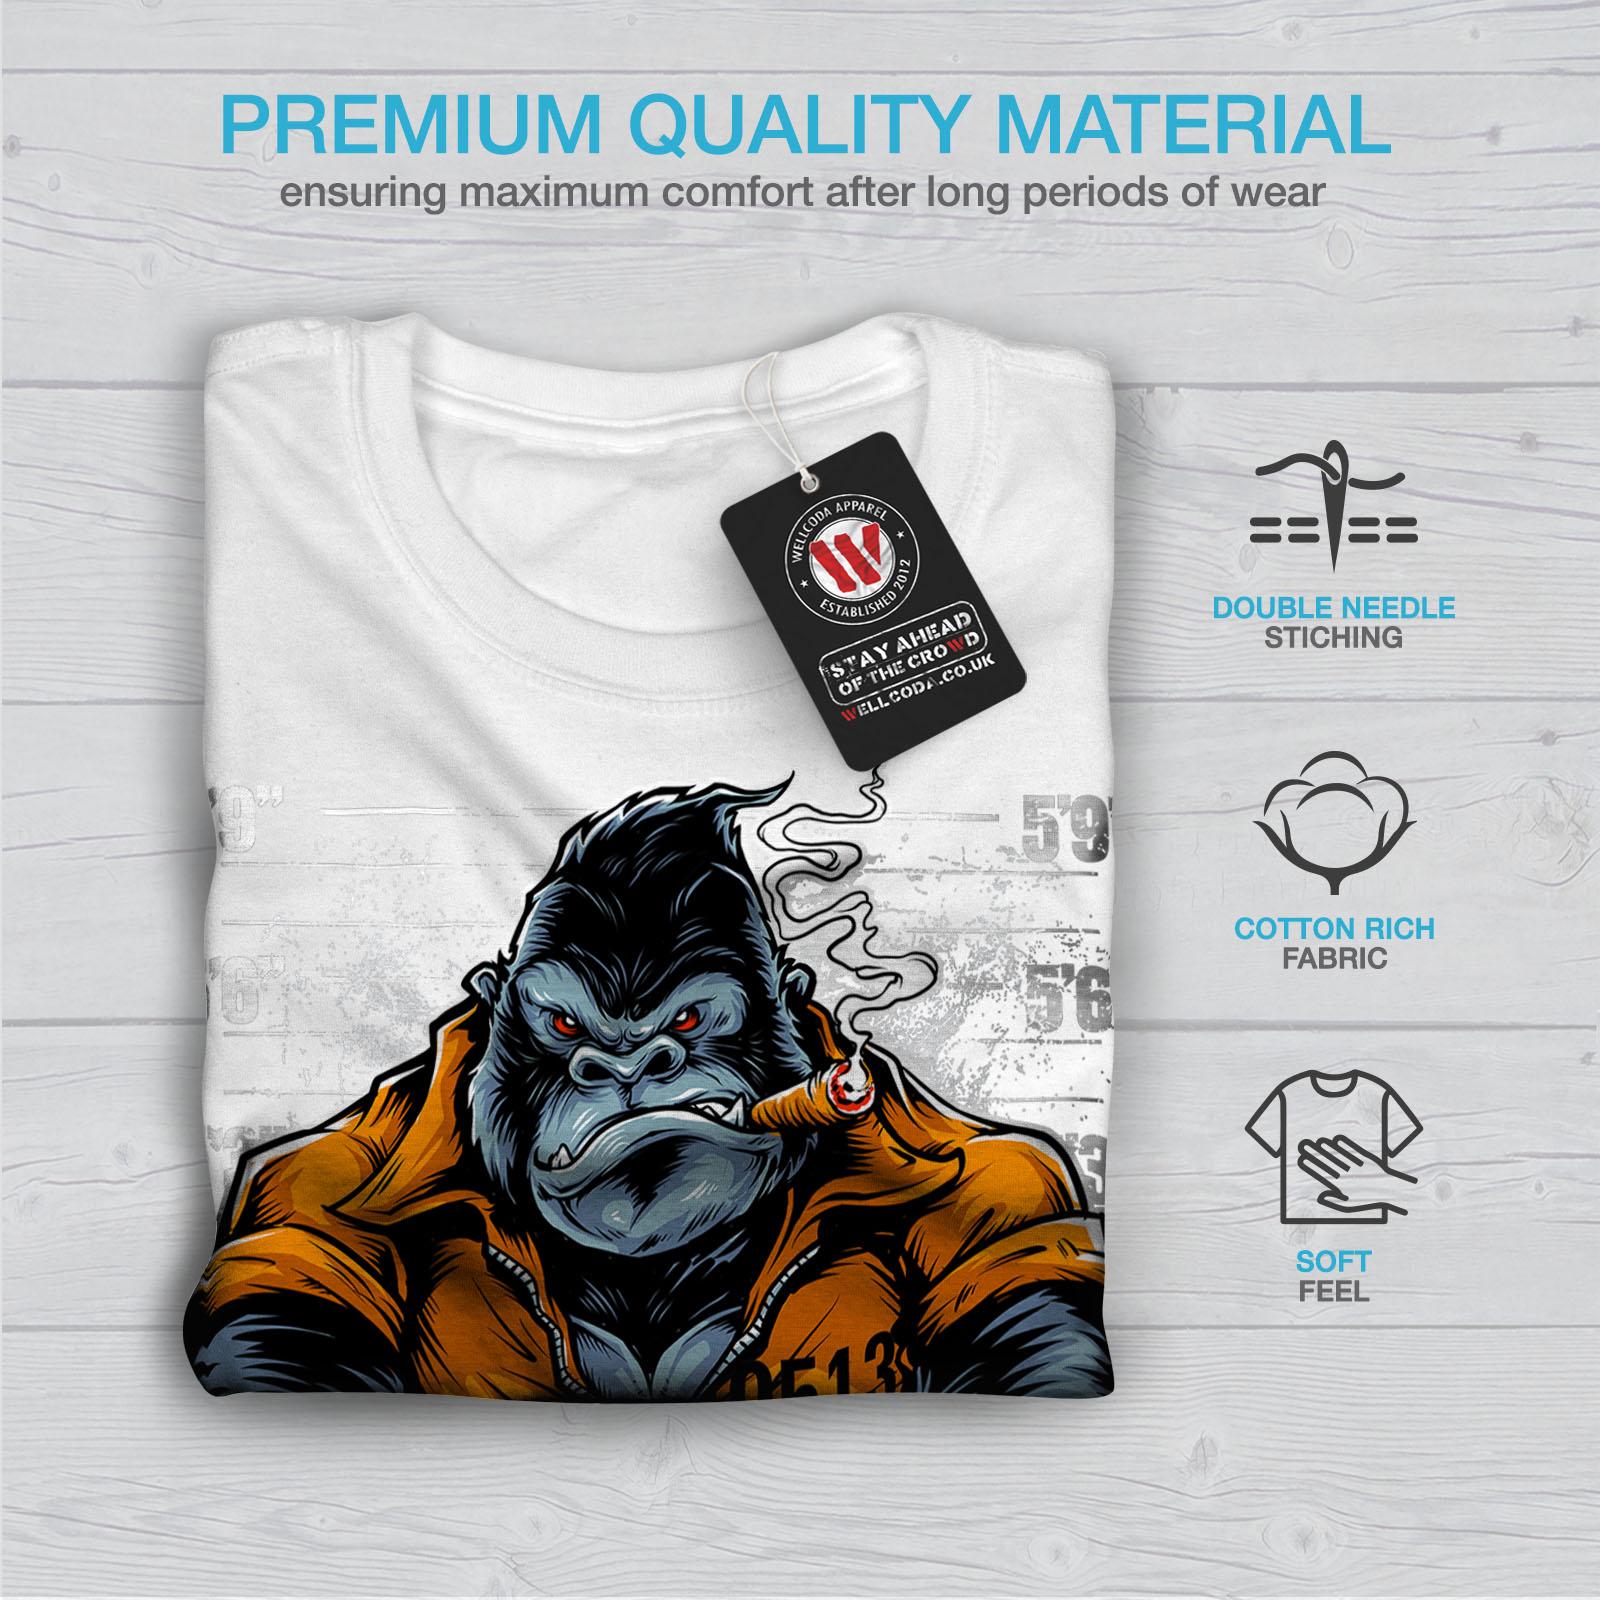 Wellcoda-Monkey-Ape-Prison-Mens-T-shirt-Wild-Graphic-Design-Printed-Tee thumbnail 13